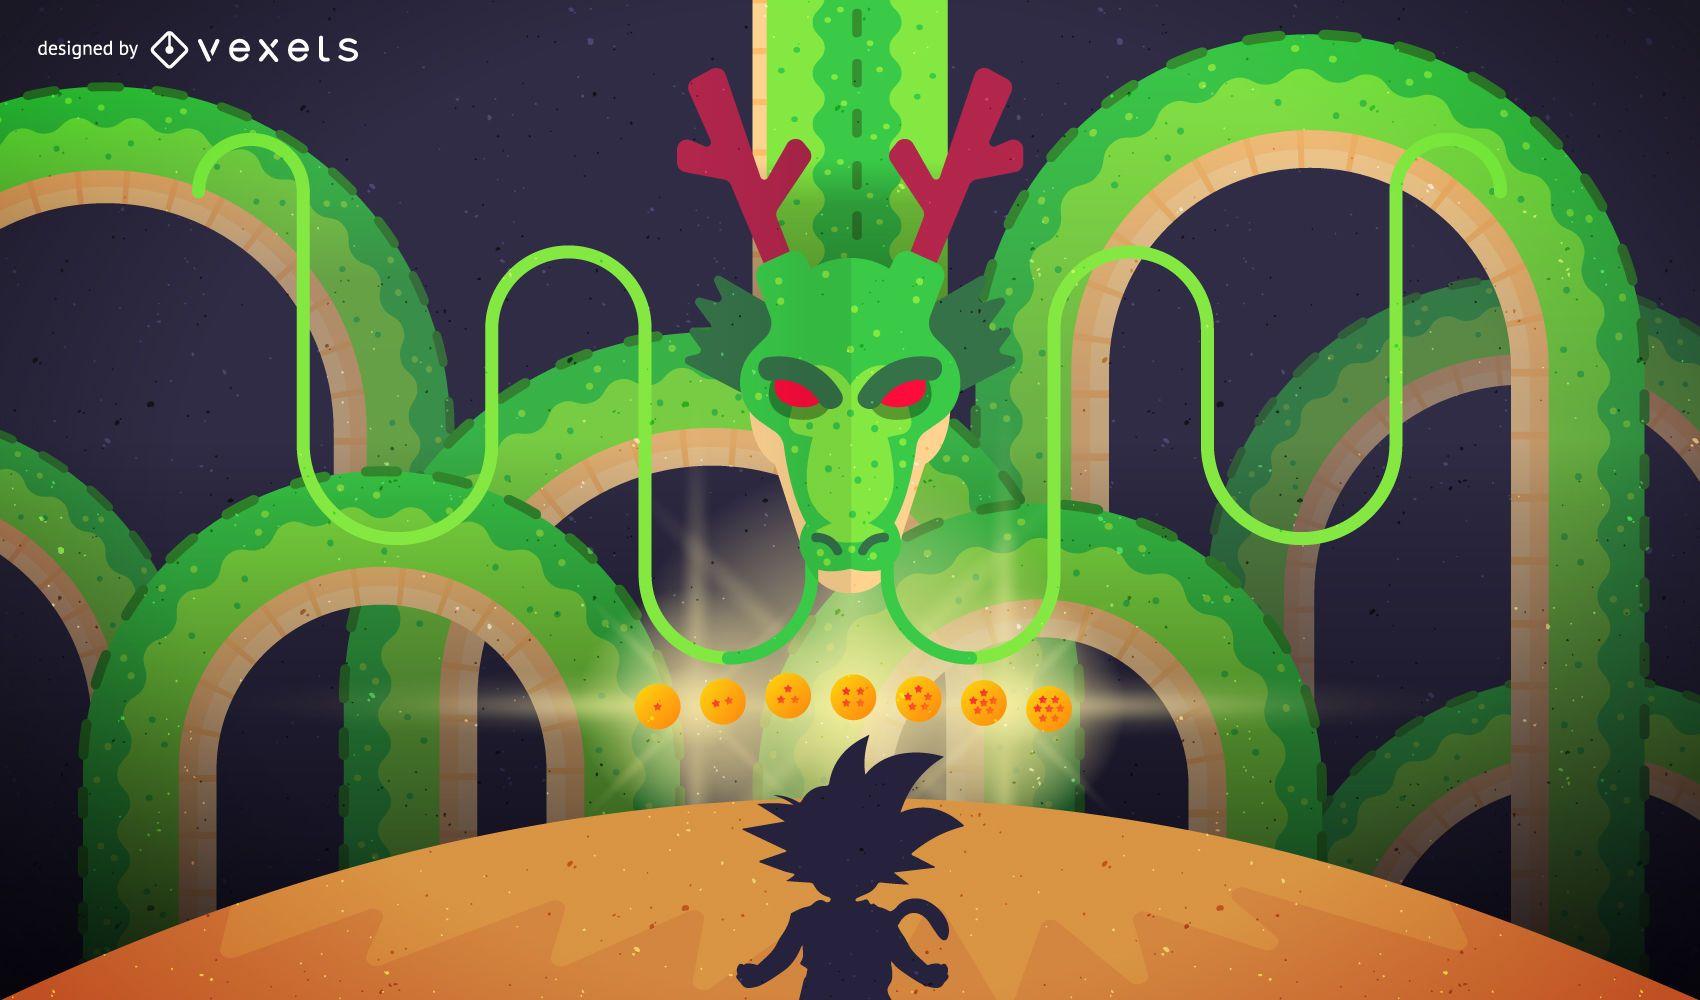 Dragon Ball artistic illustration